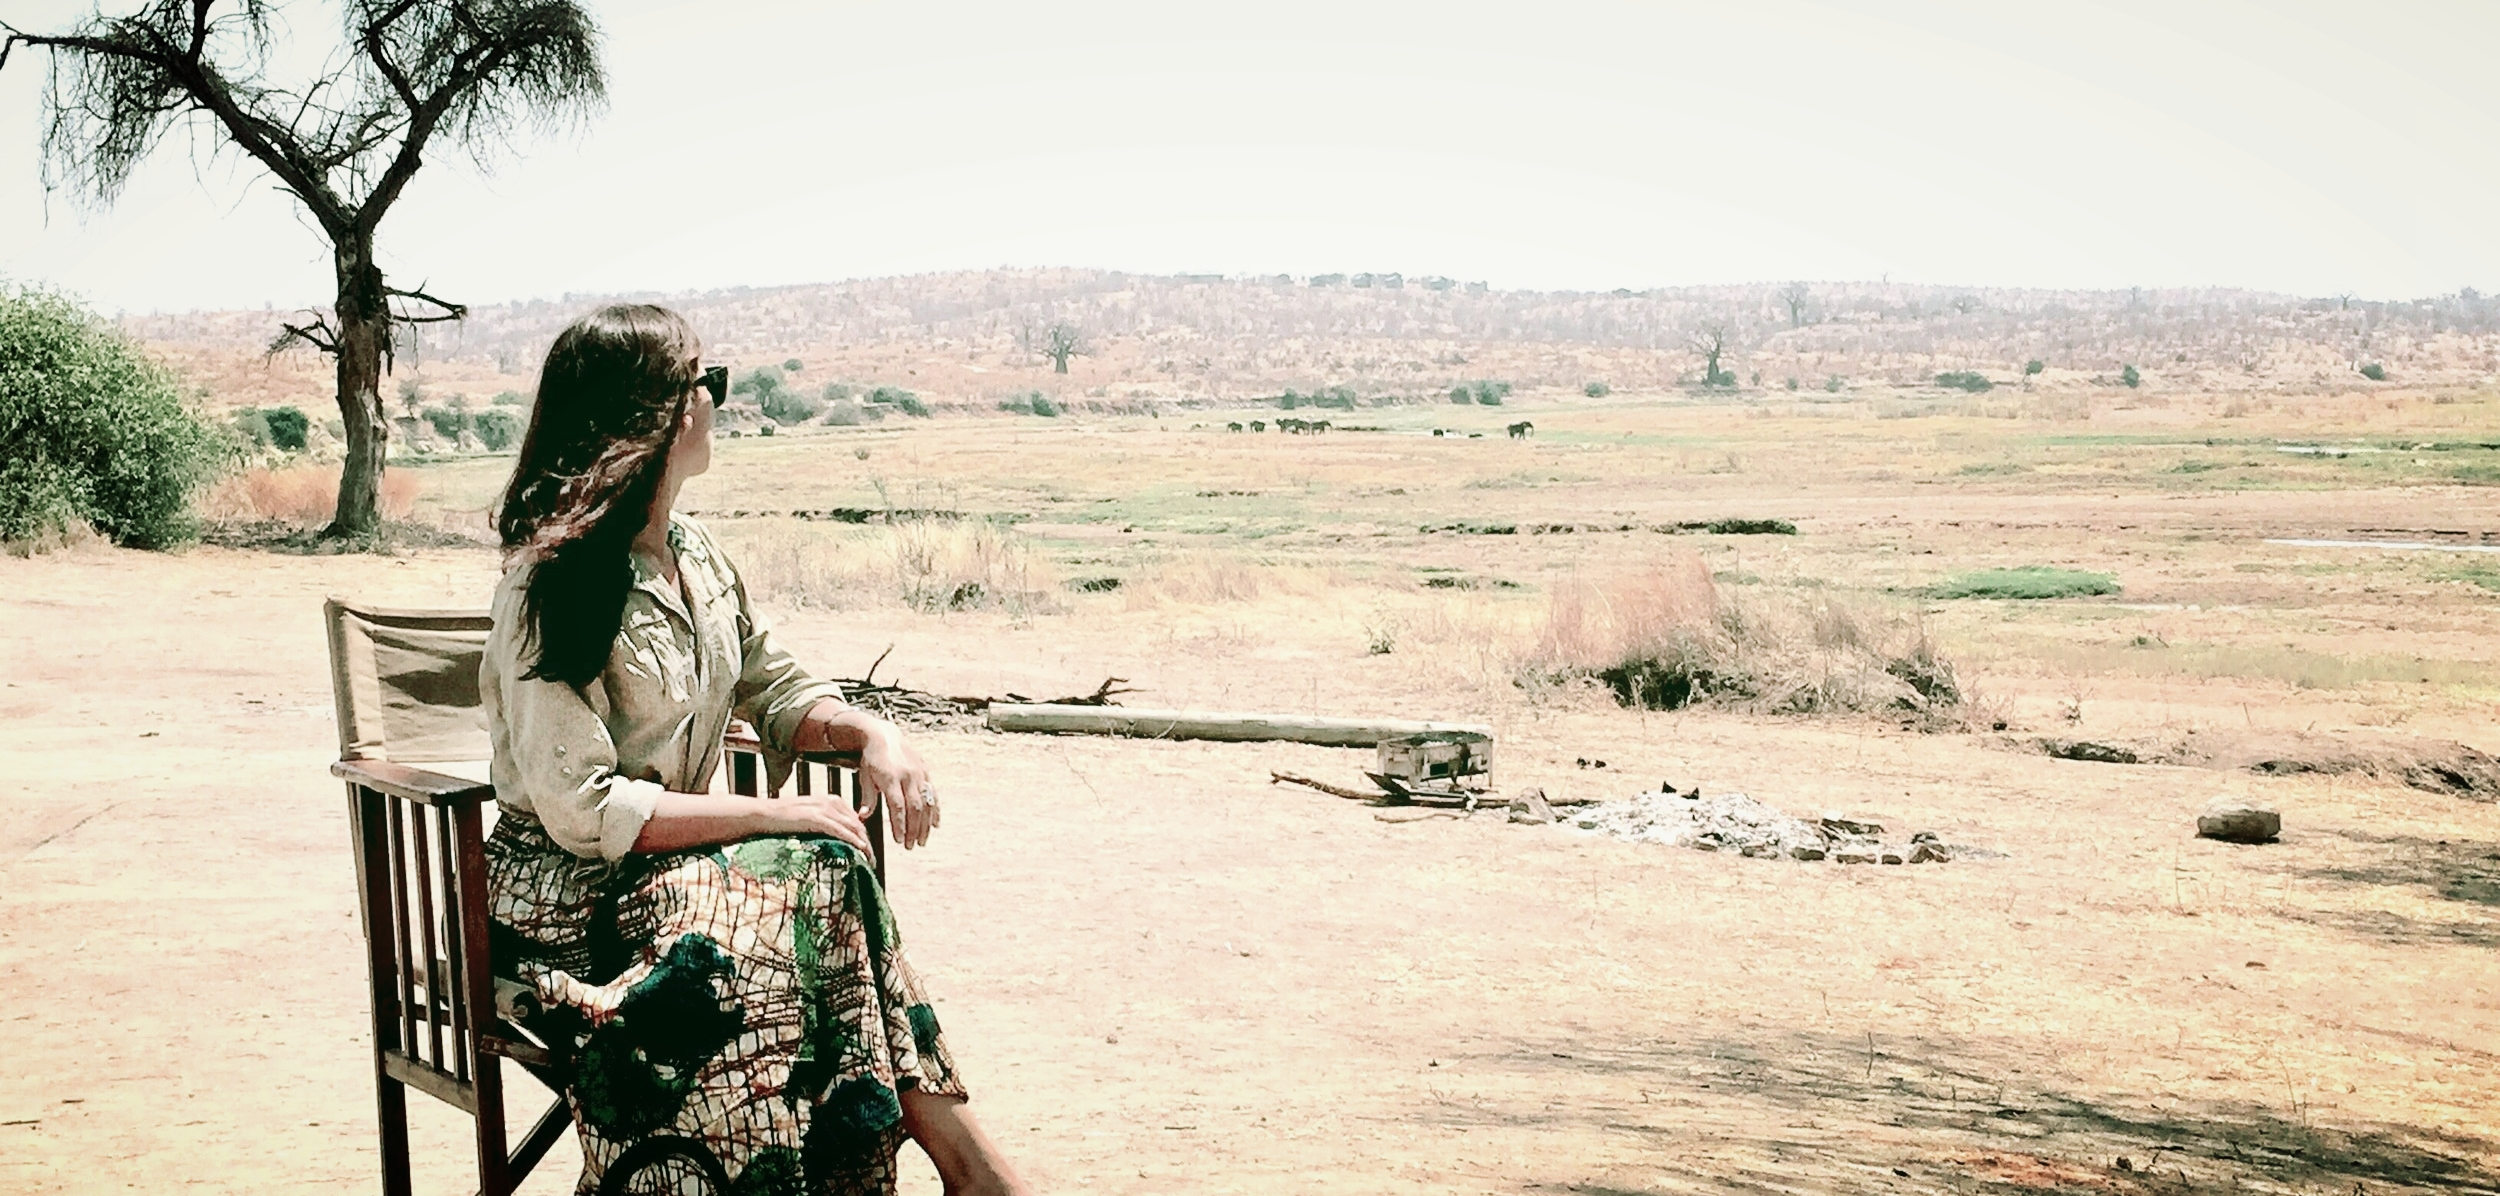 Danielle- Tanzania- 1st skirt ever made.jpg